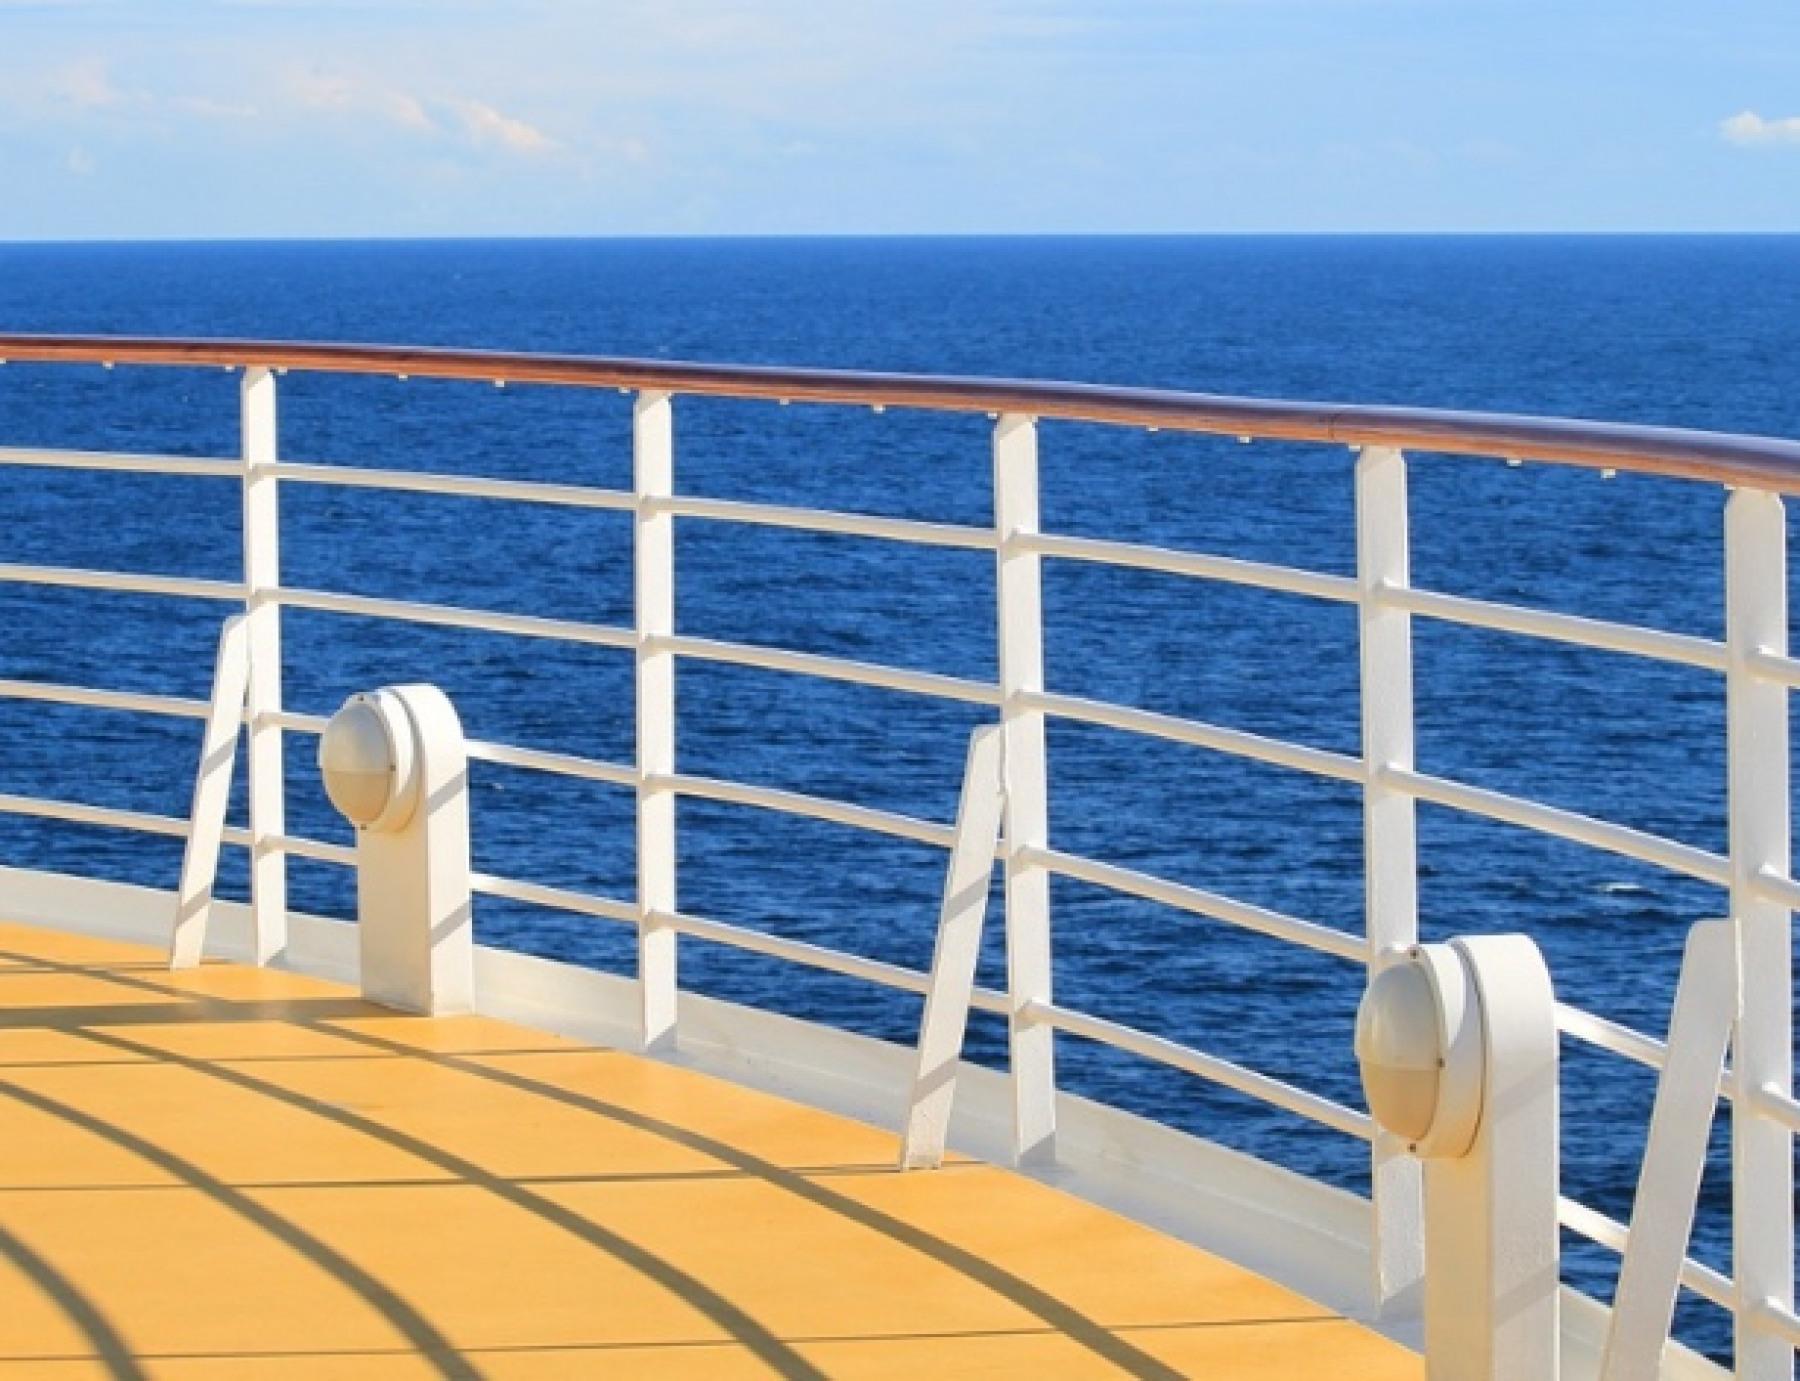 Carnival Cruise Lines Carnival Dream Interiorinternet-cafe-1.jpg